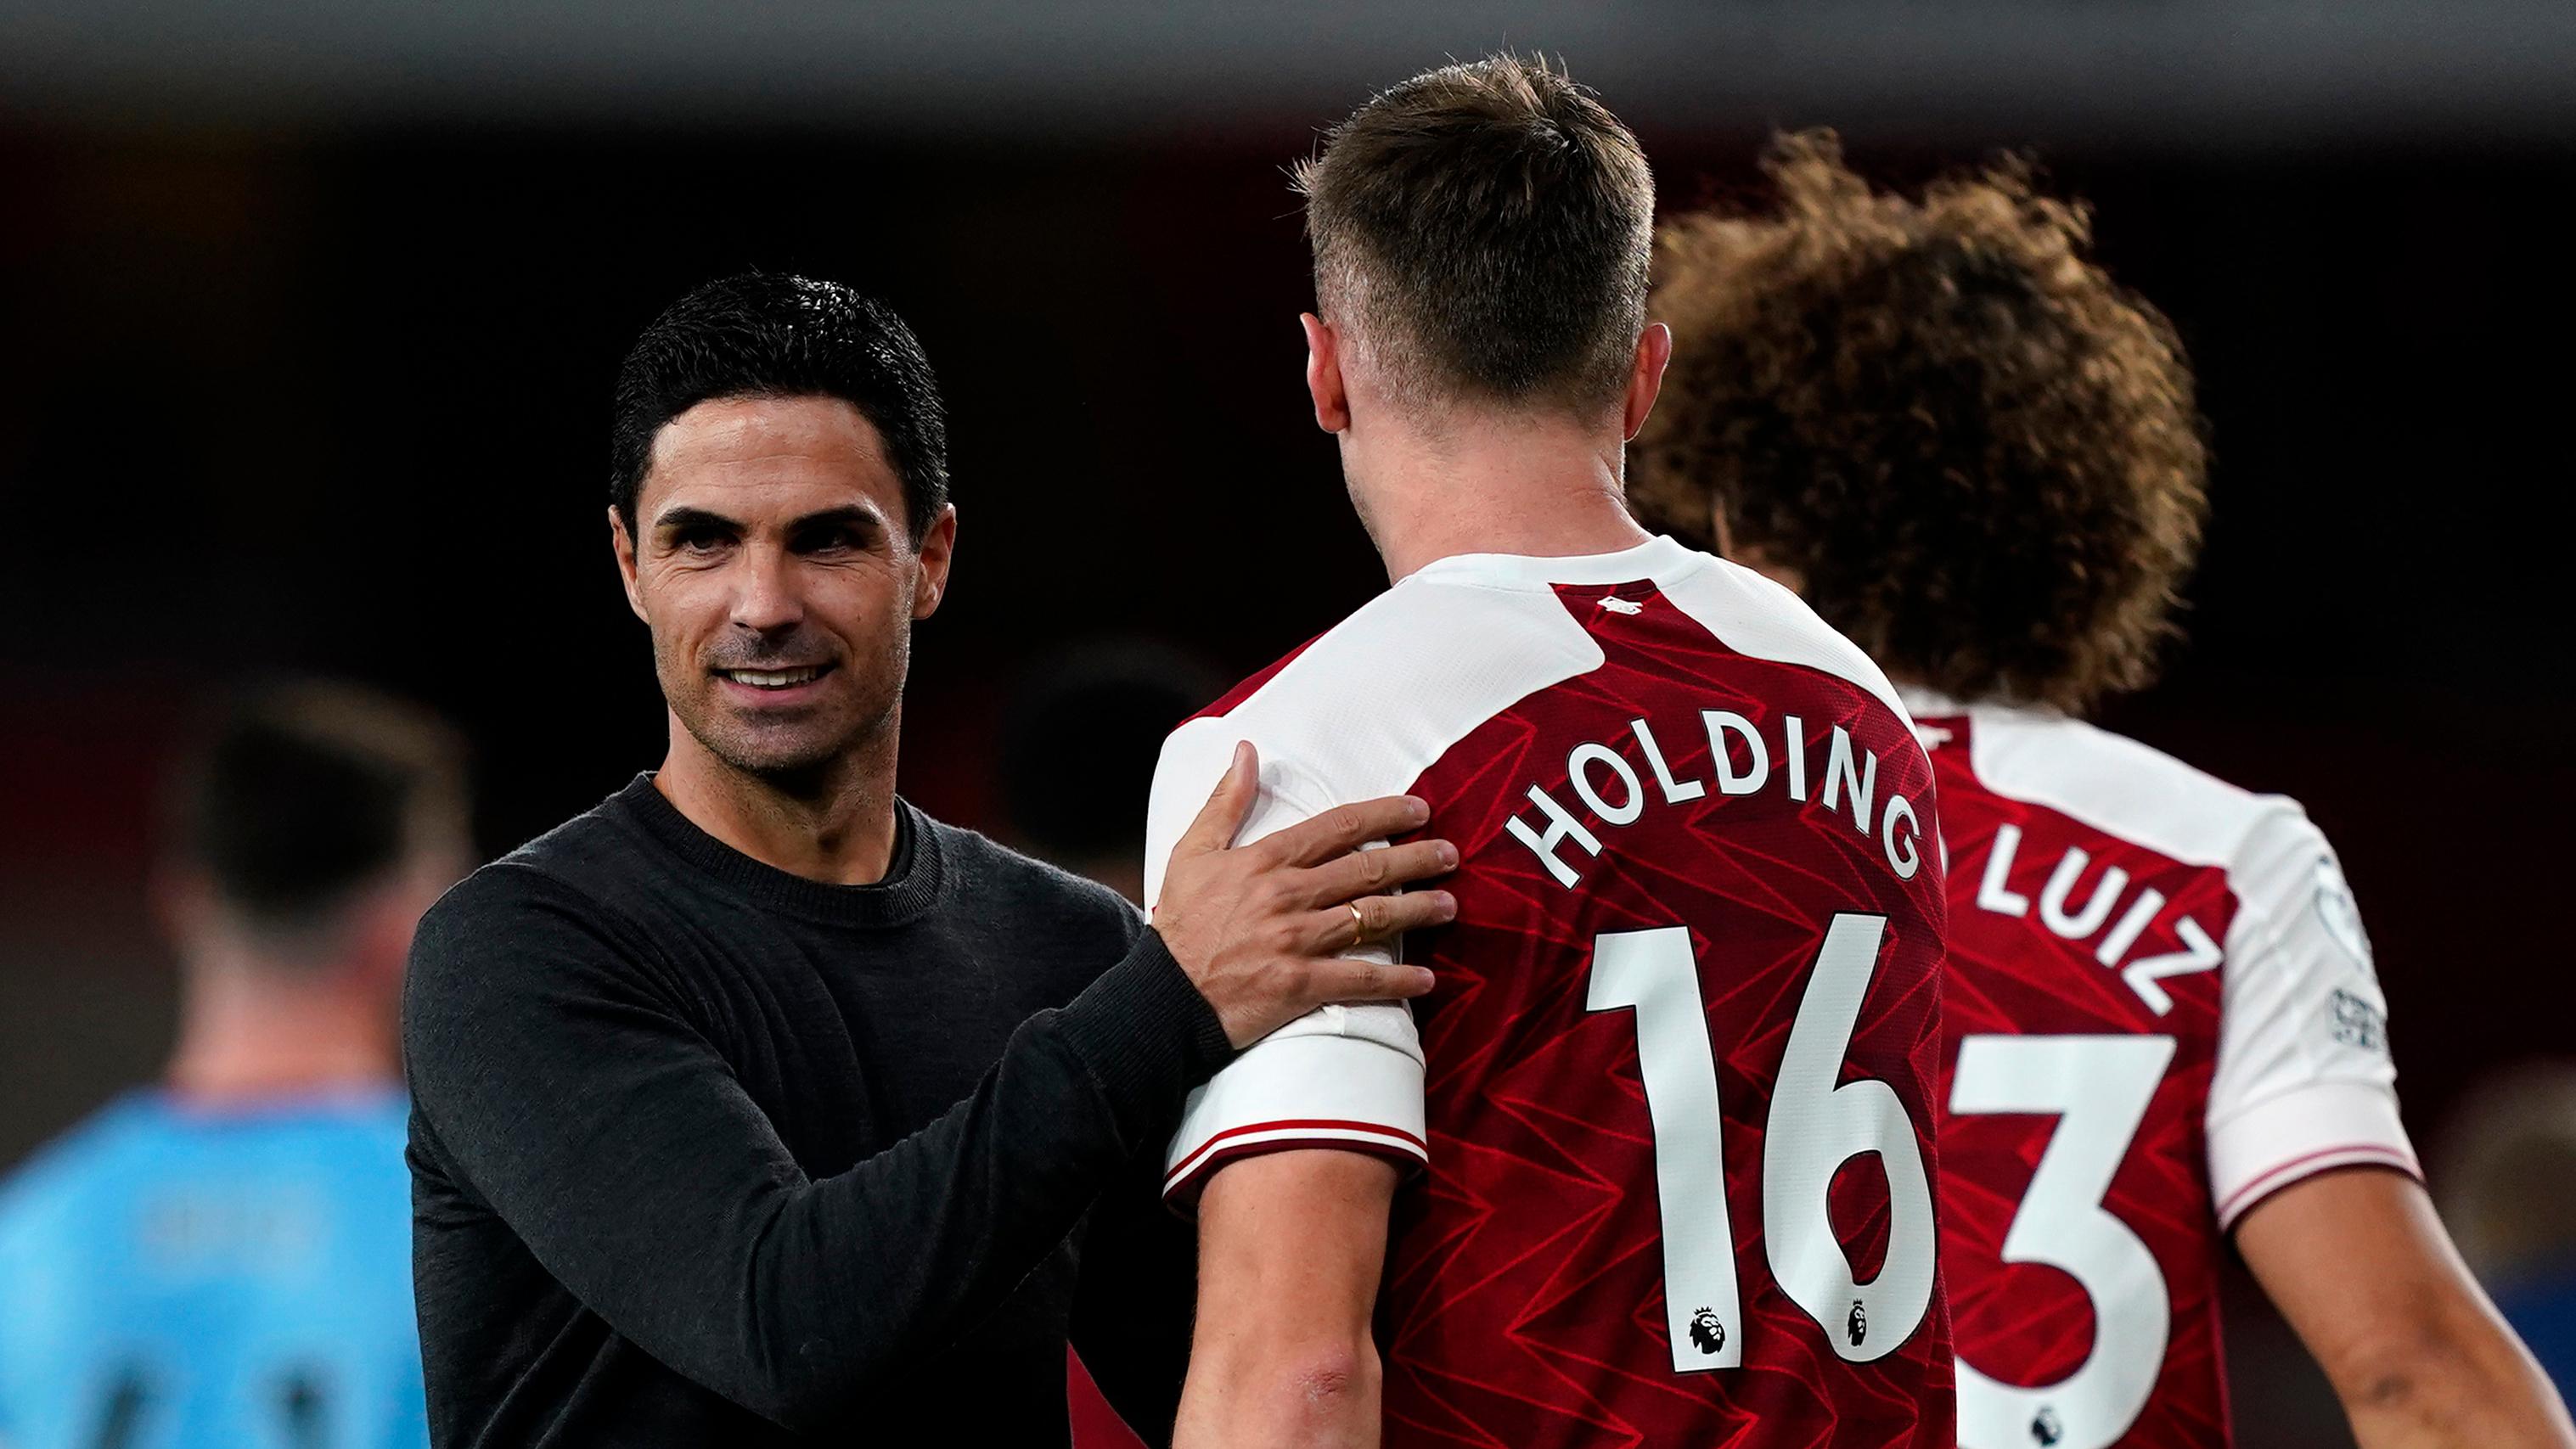 'Arteta addressing Arsenal's embarrassing soft underbelly' – Smith encouraged by 'solid' Gunners